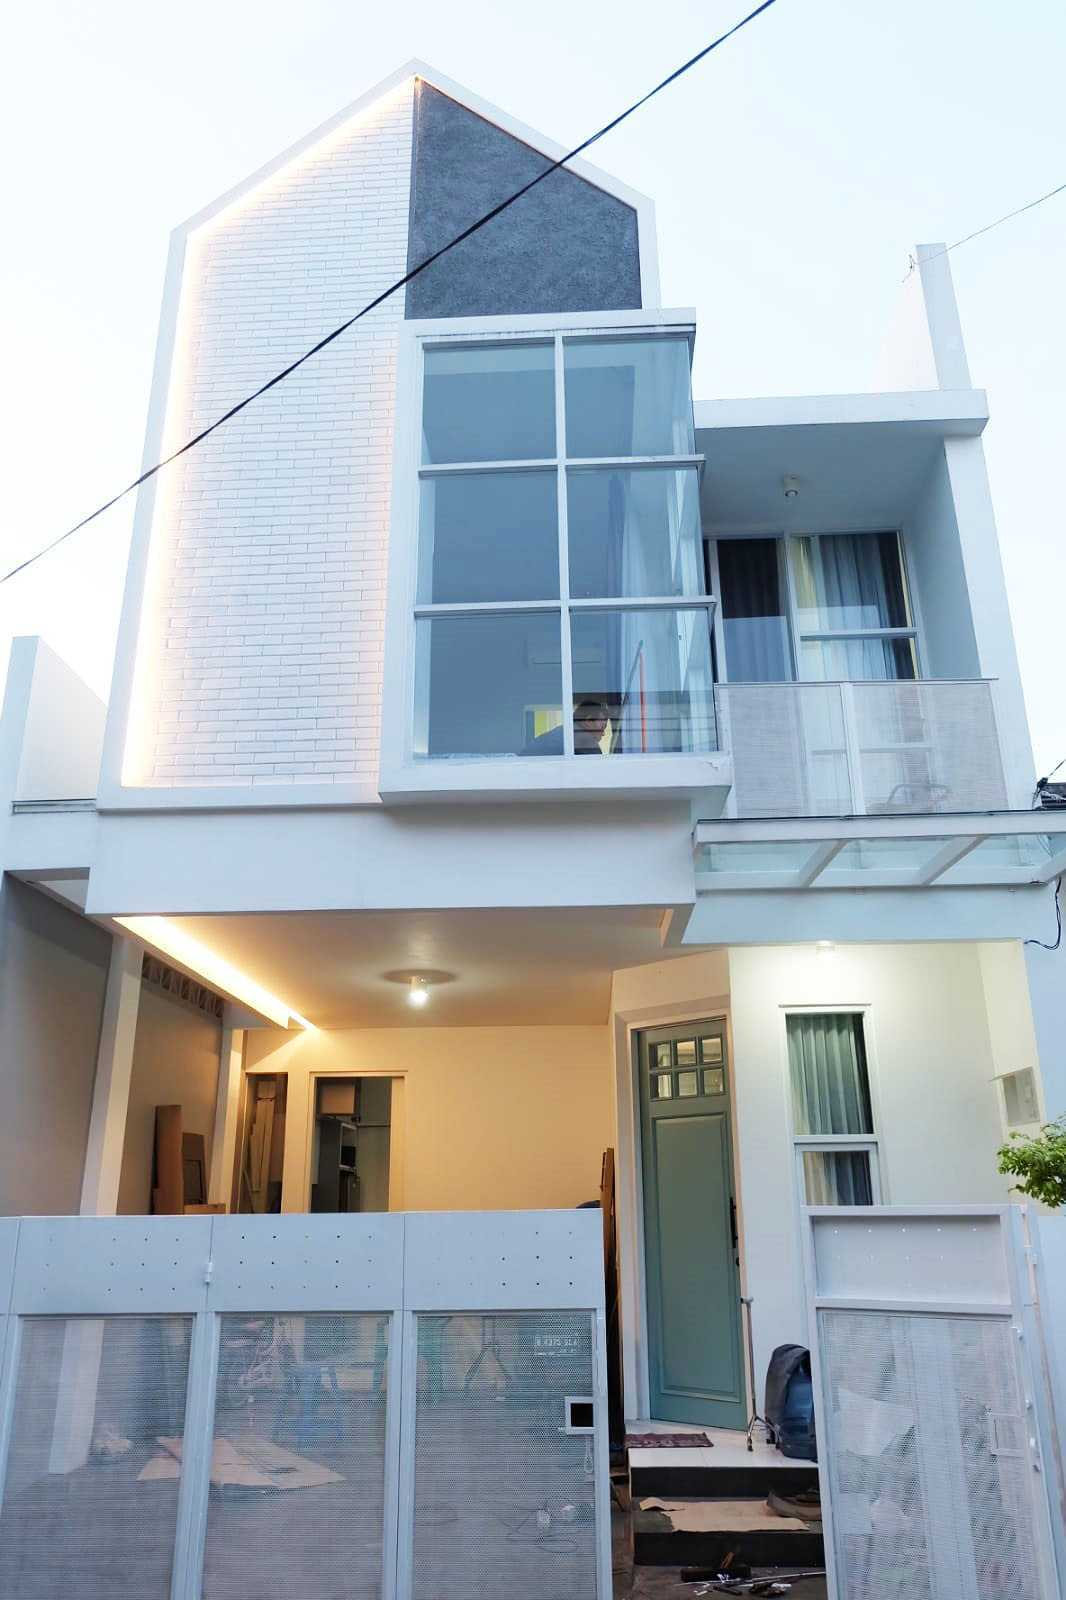 A3 Design & Build Rumah Dhyana Pesona Jl. Jombang Rw. Lele No.17, Rt.1, Jombang, Kec. Ciputat, Kota Tangerang Selatan, Banten 15414, Indonesia Jl. Jombang Rw. Lele No.17, Rt.1, Jombang, Kec. Ciputat, Kota Tangerang Selatan, Banten 15414, Indonesia A-3-D-Es-I-G-N-B-U-I-L-D-Rumah-Dhyana-Pesona   137304